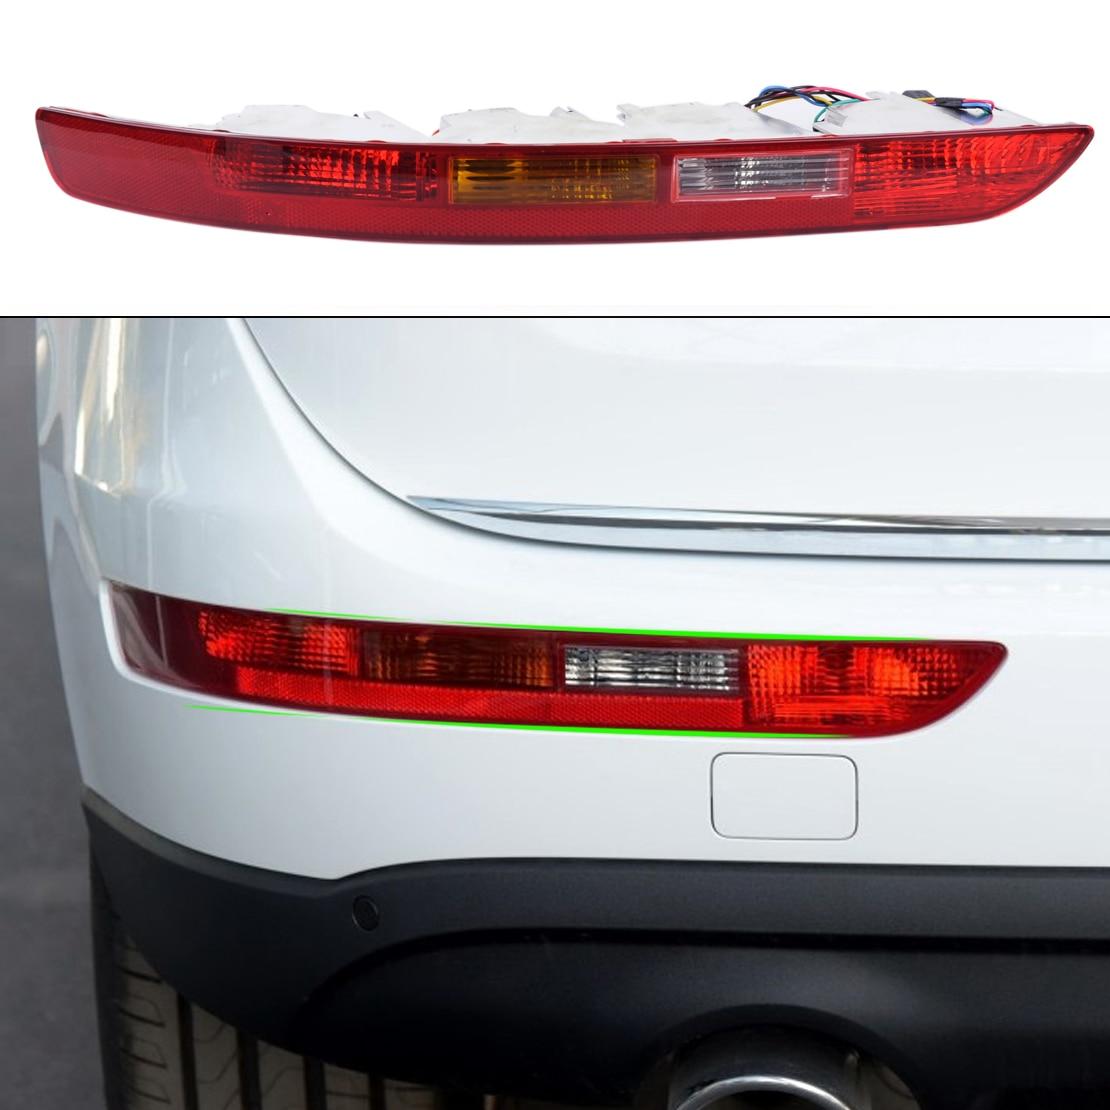 beler Rear Left Lower Bumper Taillight Lamp Reverse Fog Lamp Assembly 8R0945095 for Audi Q5 2009 2010 2011 2012 2013 2014-2016 mzorange car rear tail bumper reflector lamp fog light clearance lights for subaru outback 2009 2010 2011 2012 2013 2014